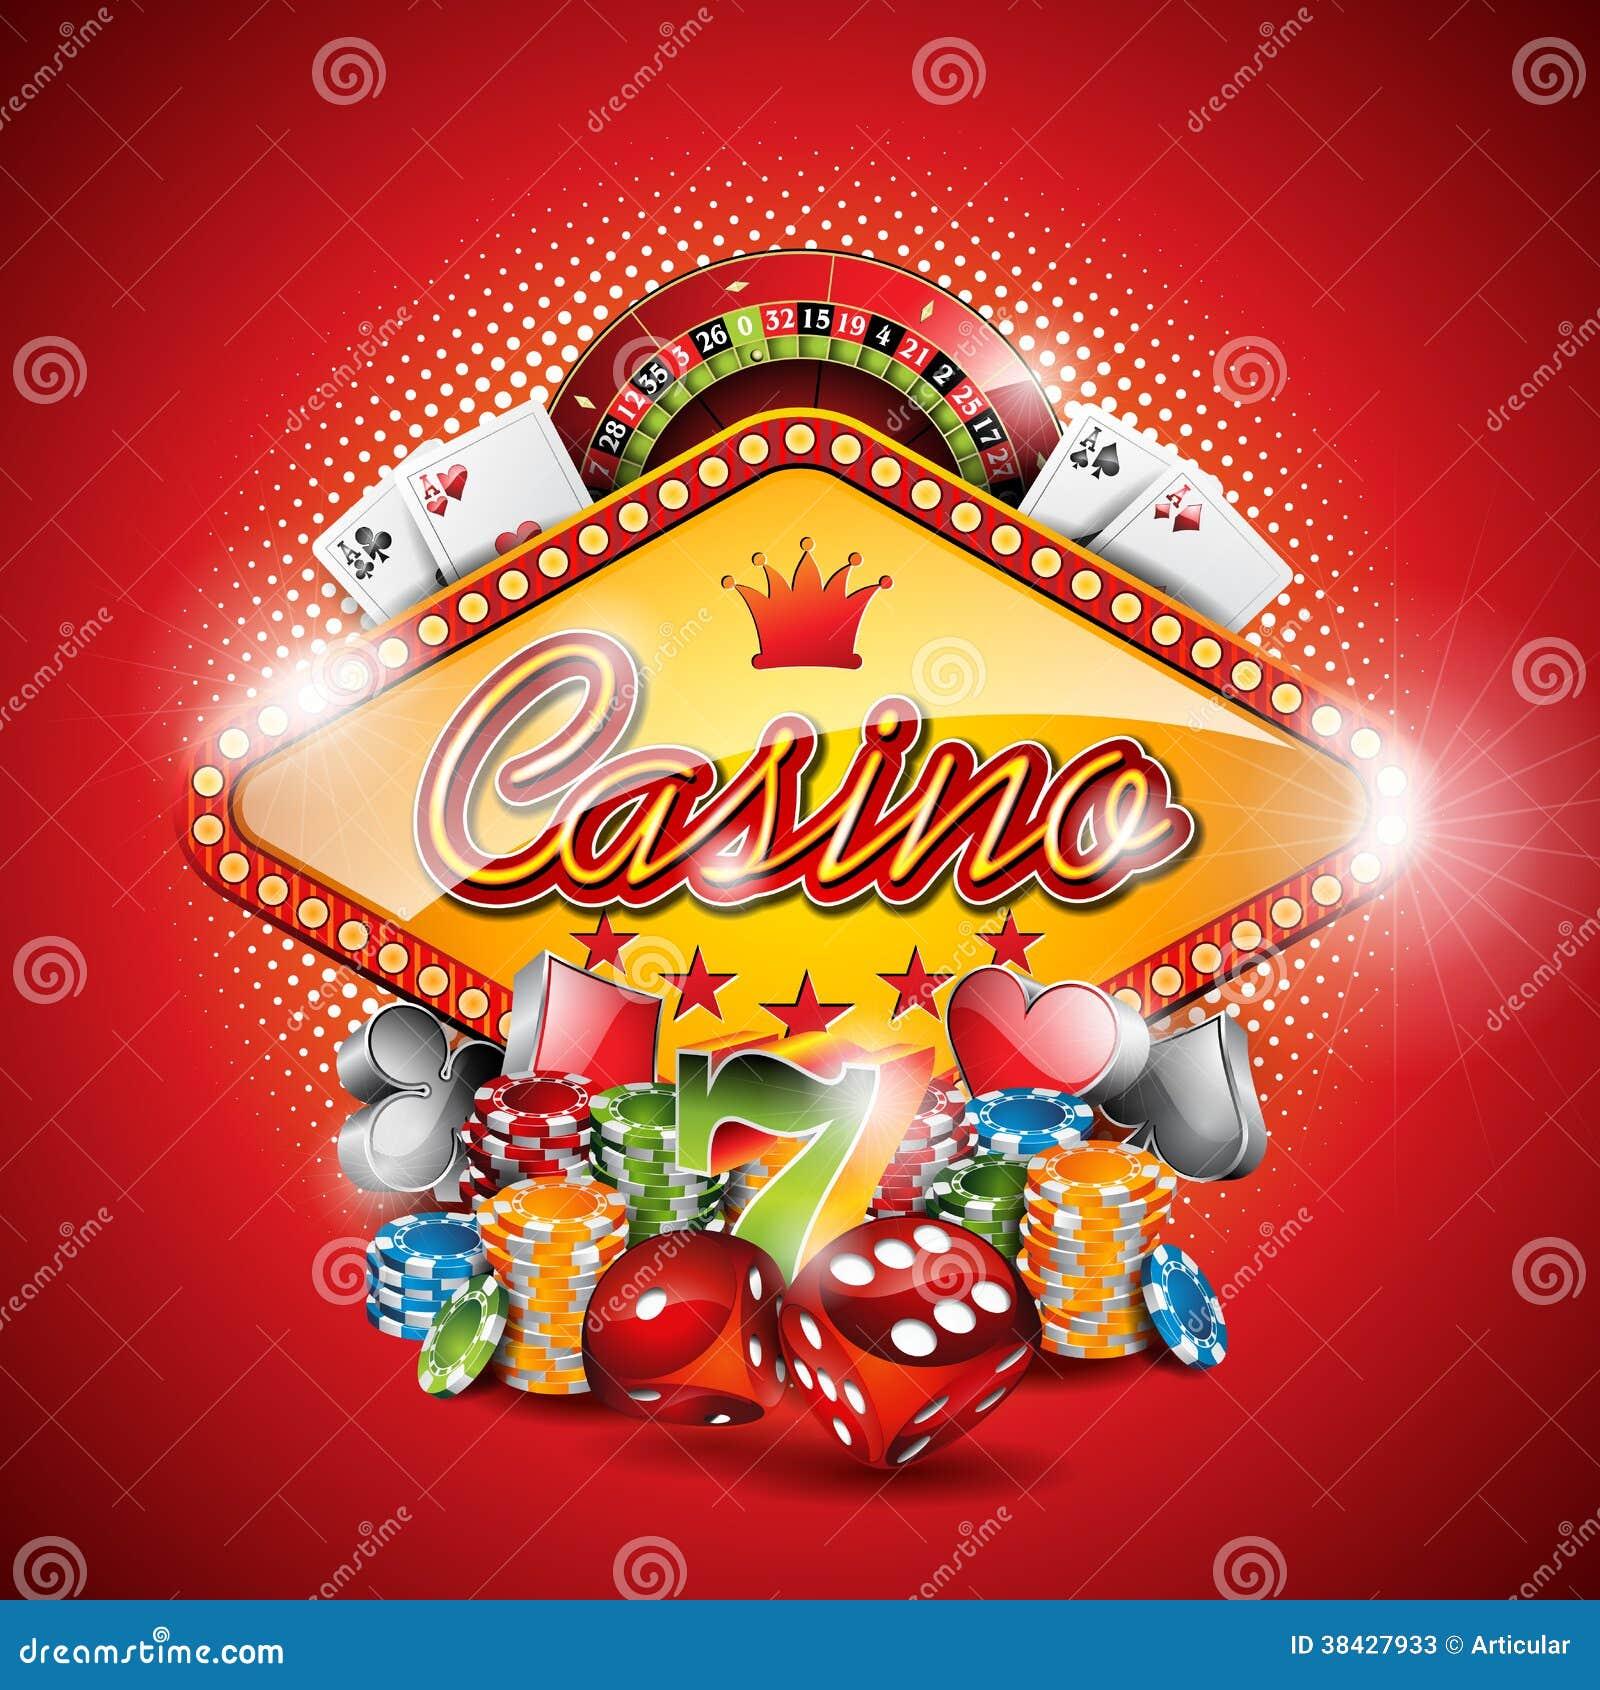 Casino 888 es online confiable Bilbao-279644